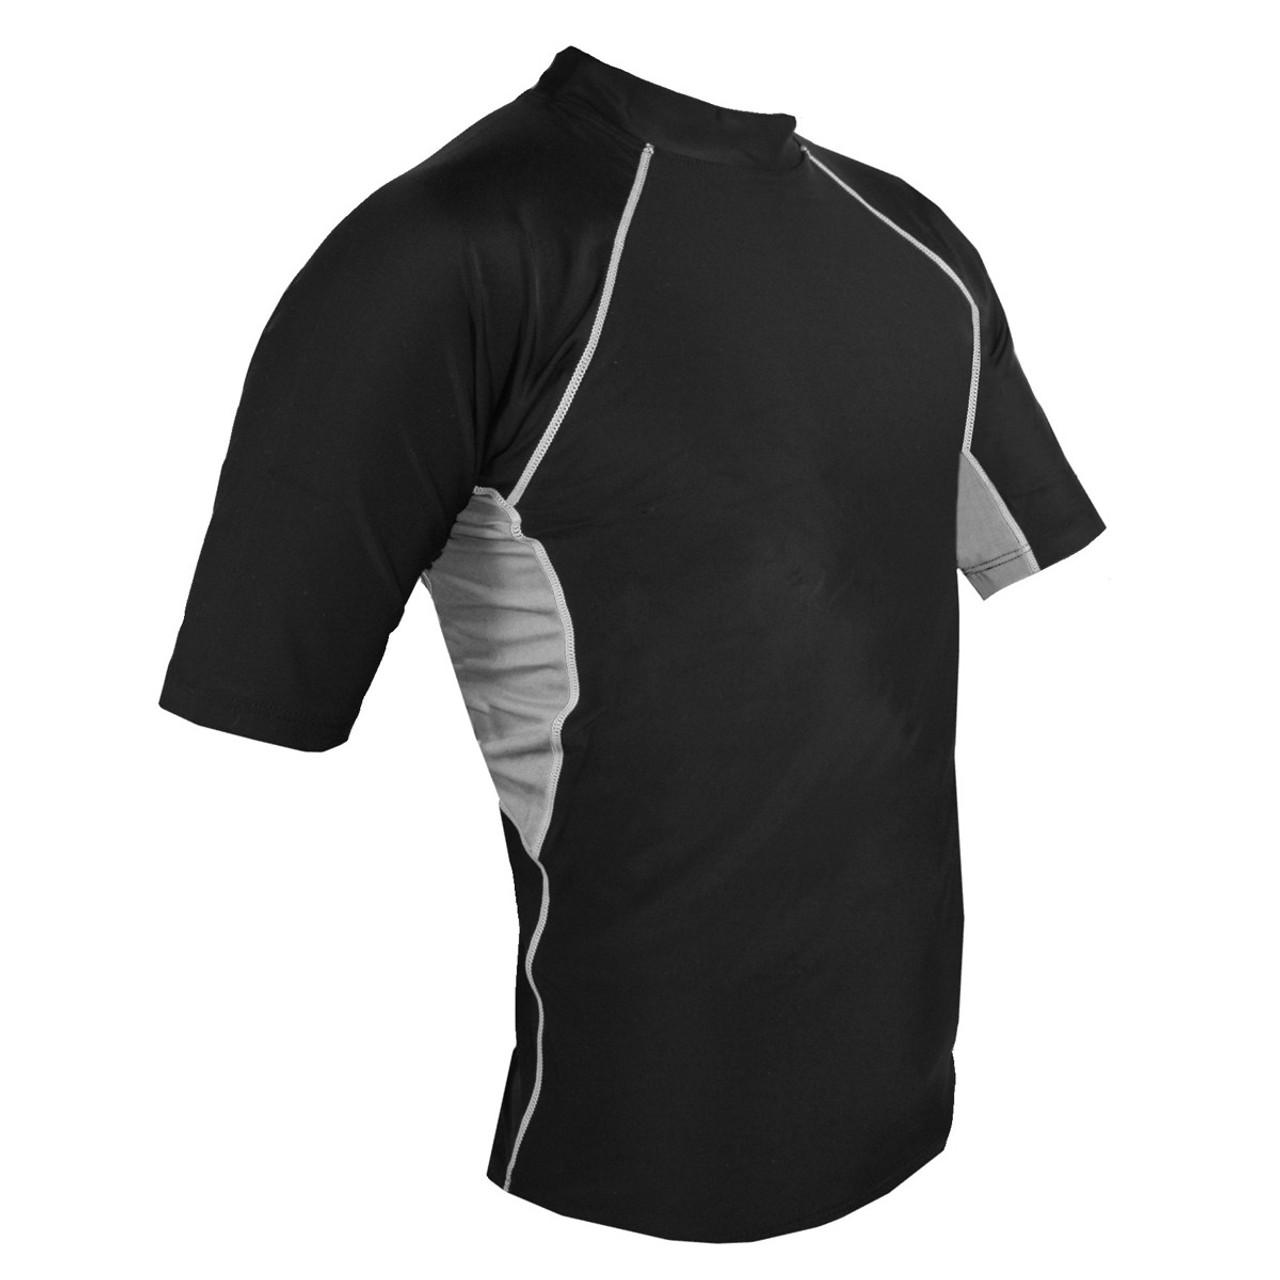 219e1c37c7 Mens Tuga Short Sleeve UV Swim Shirt Black | Mens UV Clothing